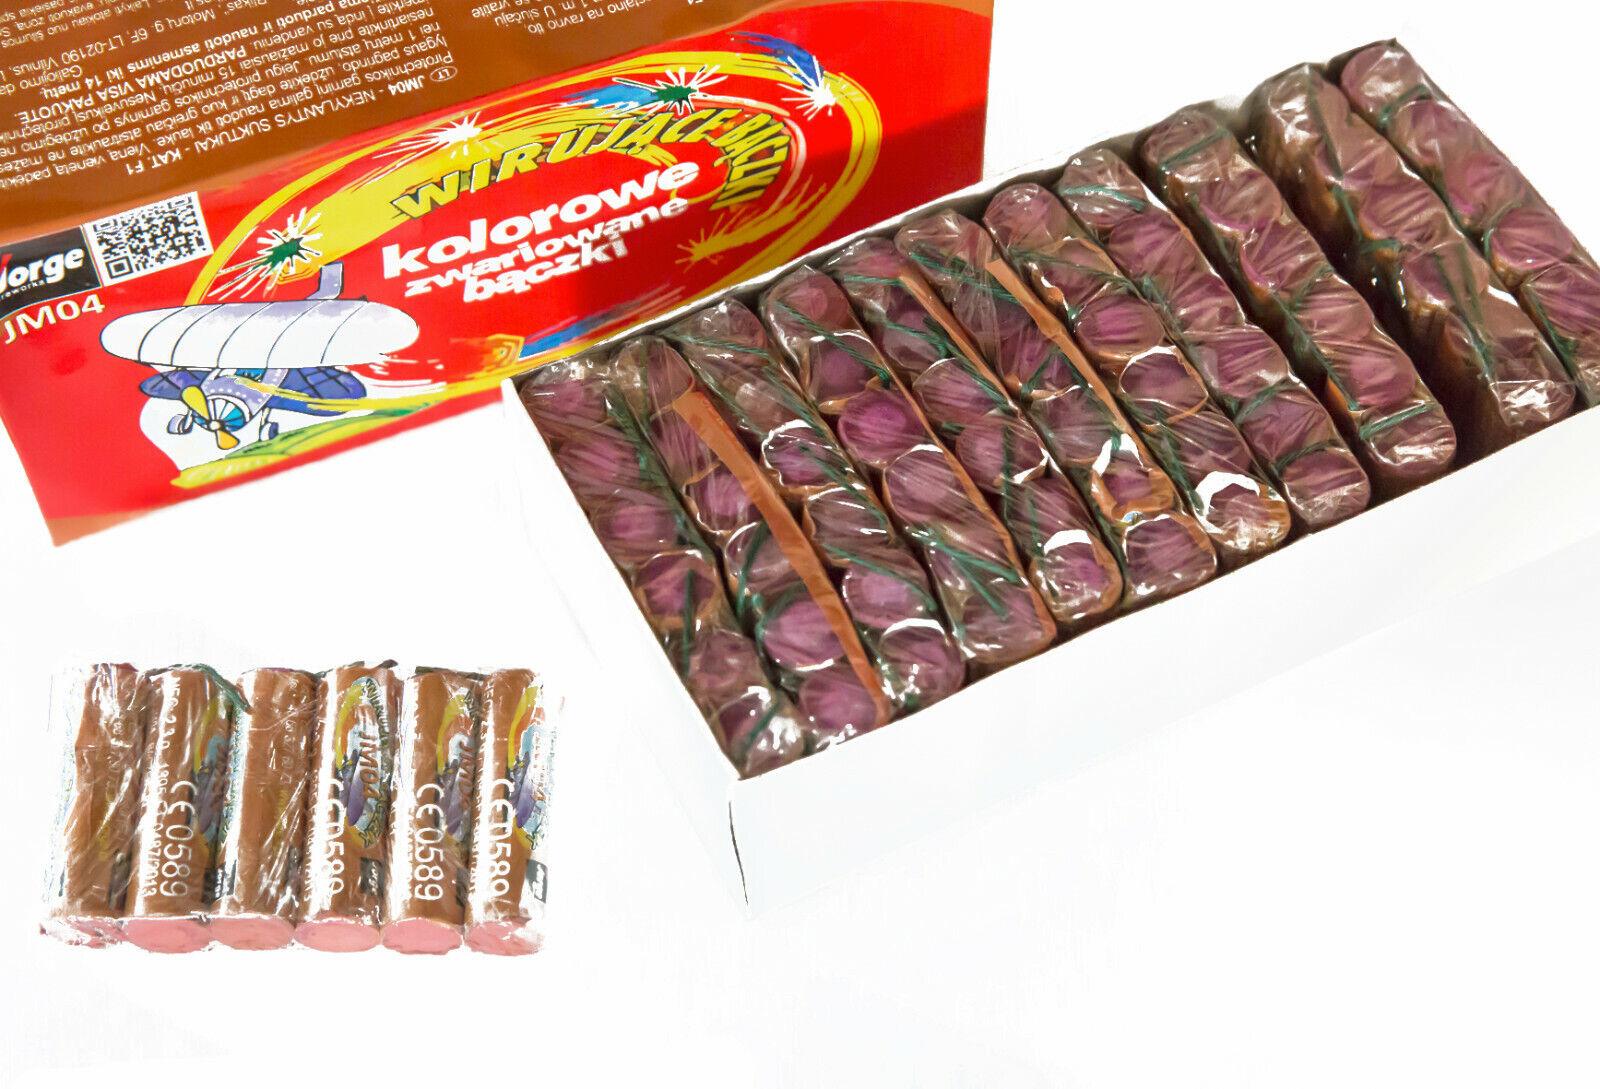 Jorge 72 Bodenwirbel  Jugend Kinder Feuerwerk Sortiment